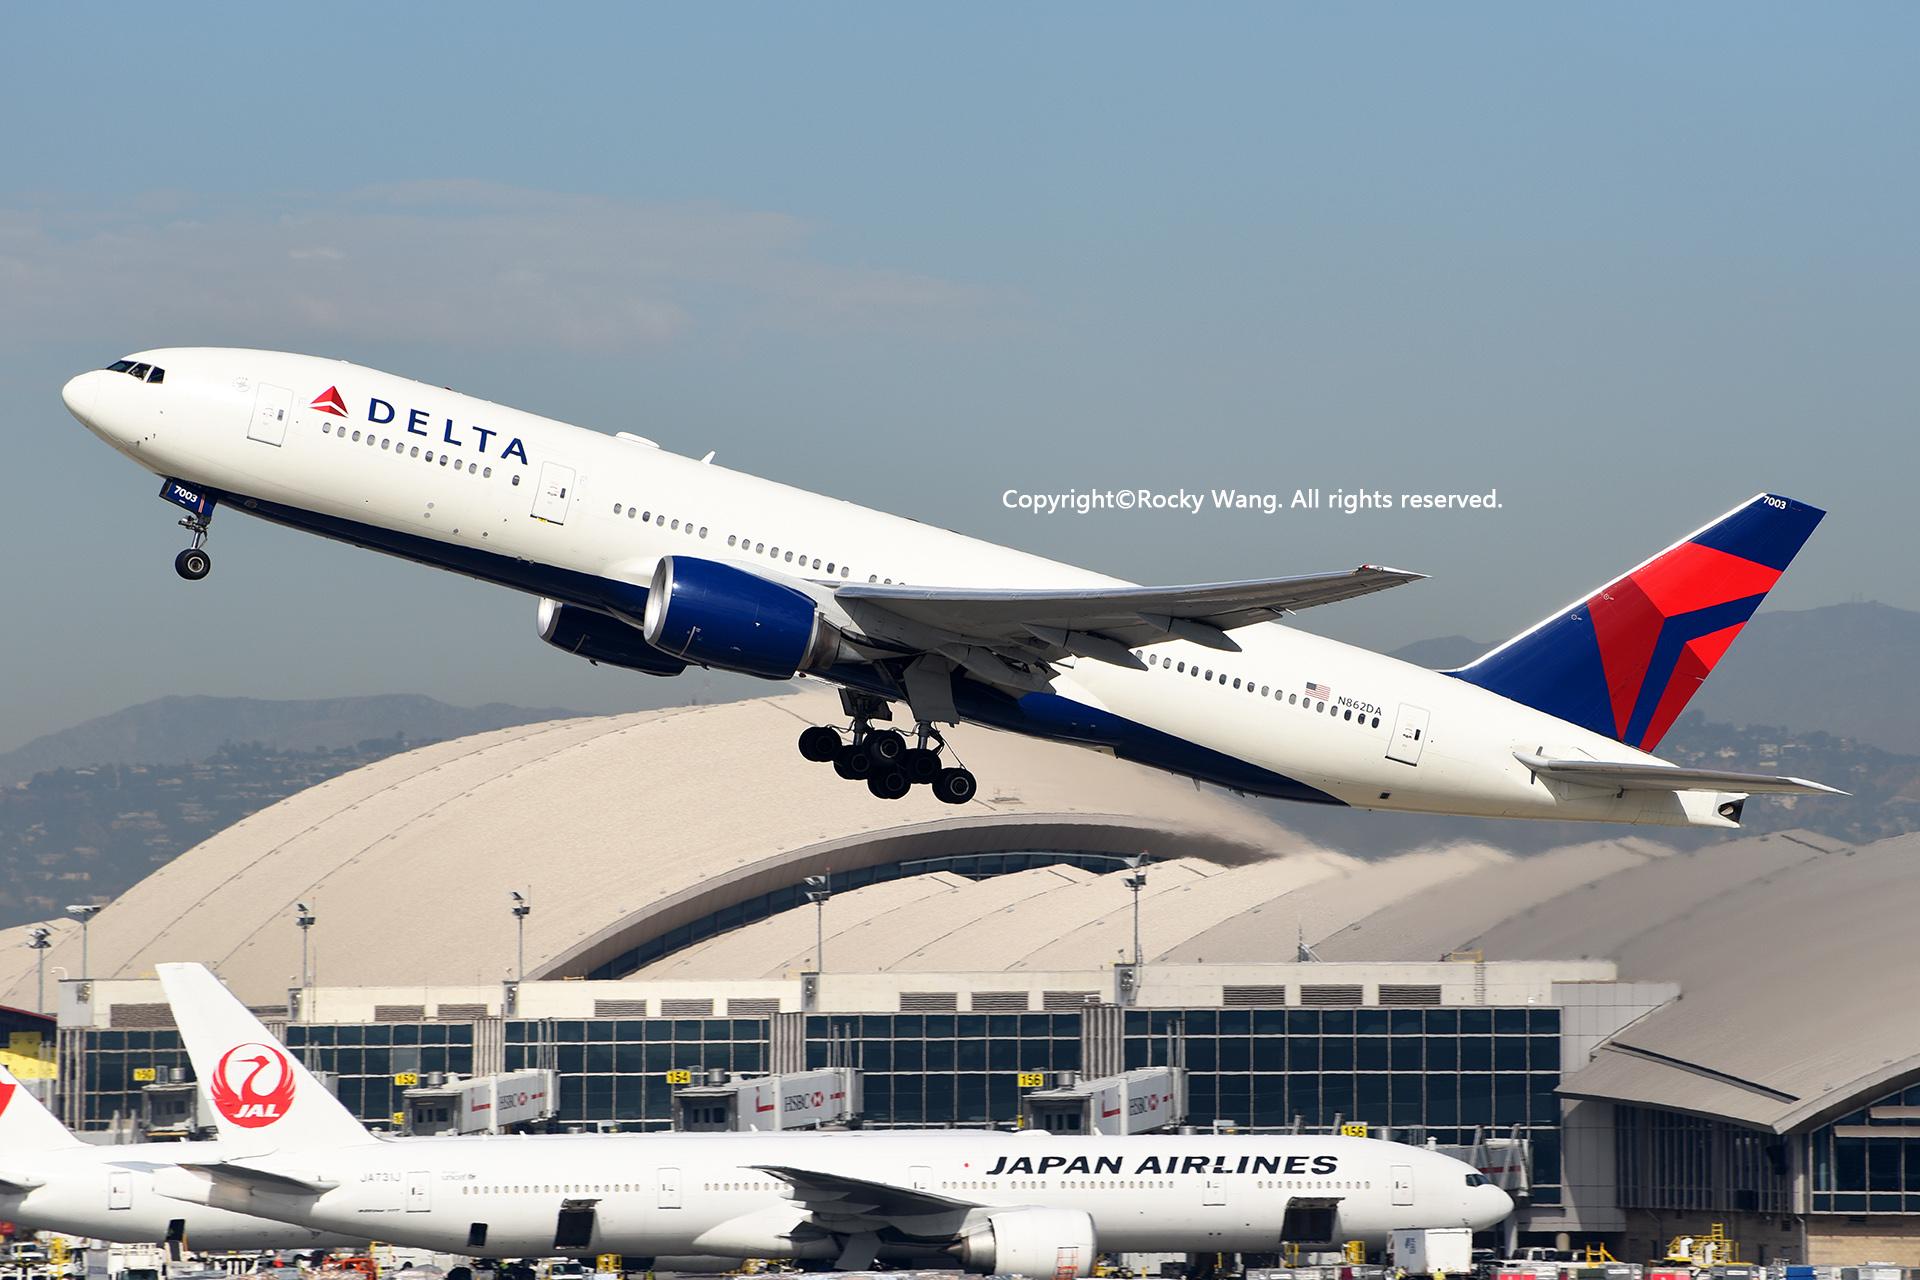 Re:[原创]居家了 批量处理老图 倾情奉献52家777 BOEING 777-232(ER) N862DA Los Angeles Int'l Airport